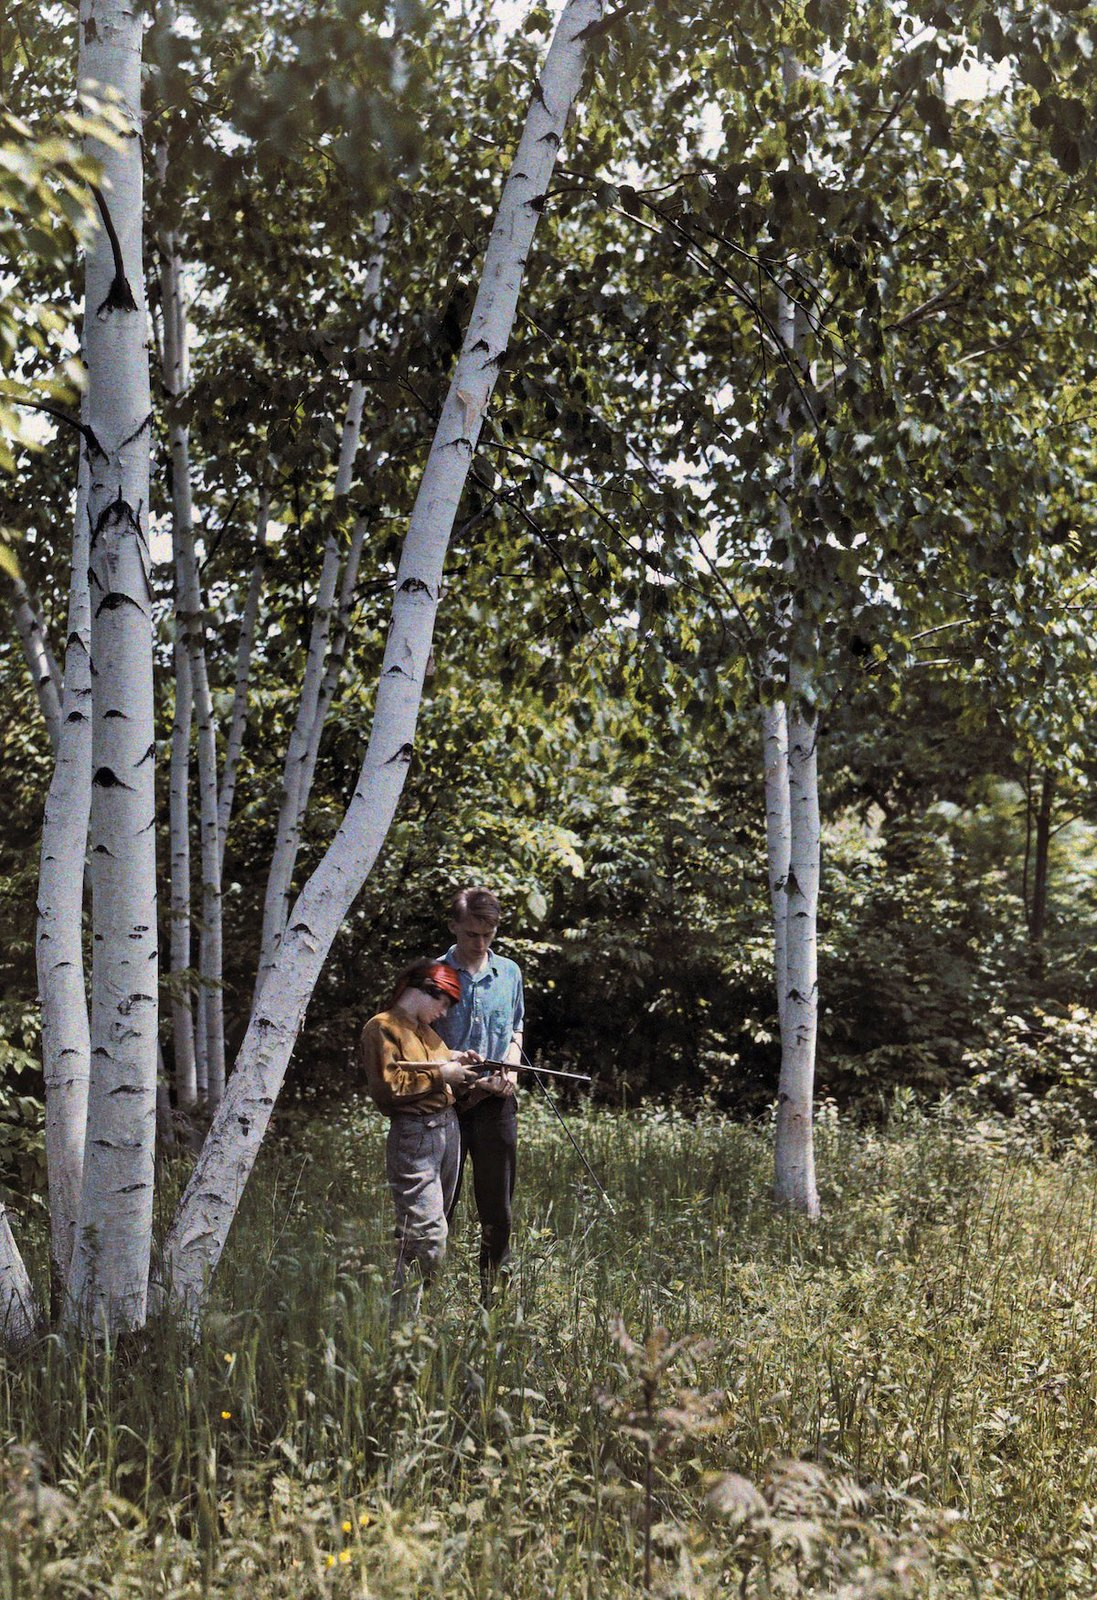 1927. Беннингтон, Вермонт – два человека стоят среди белых берез в долине Баттенкилл. Клифтон Р. Адамс